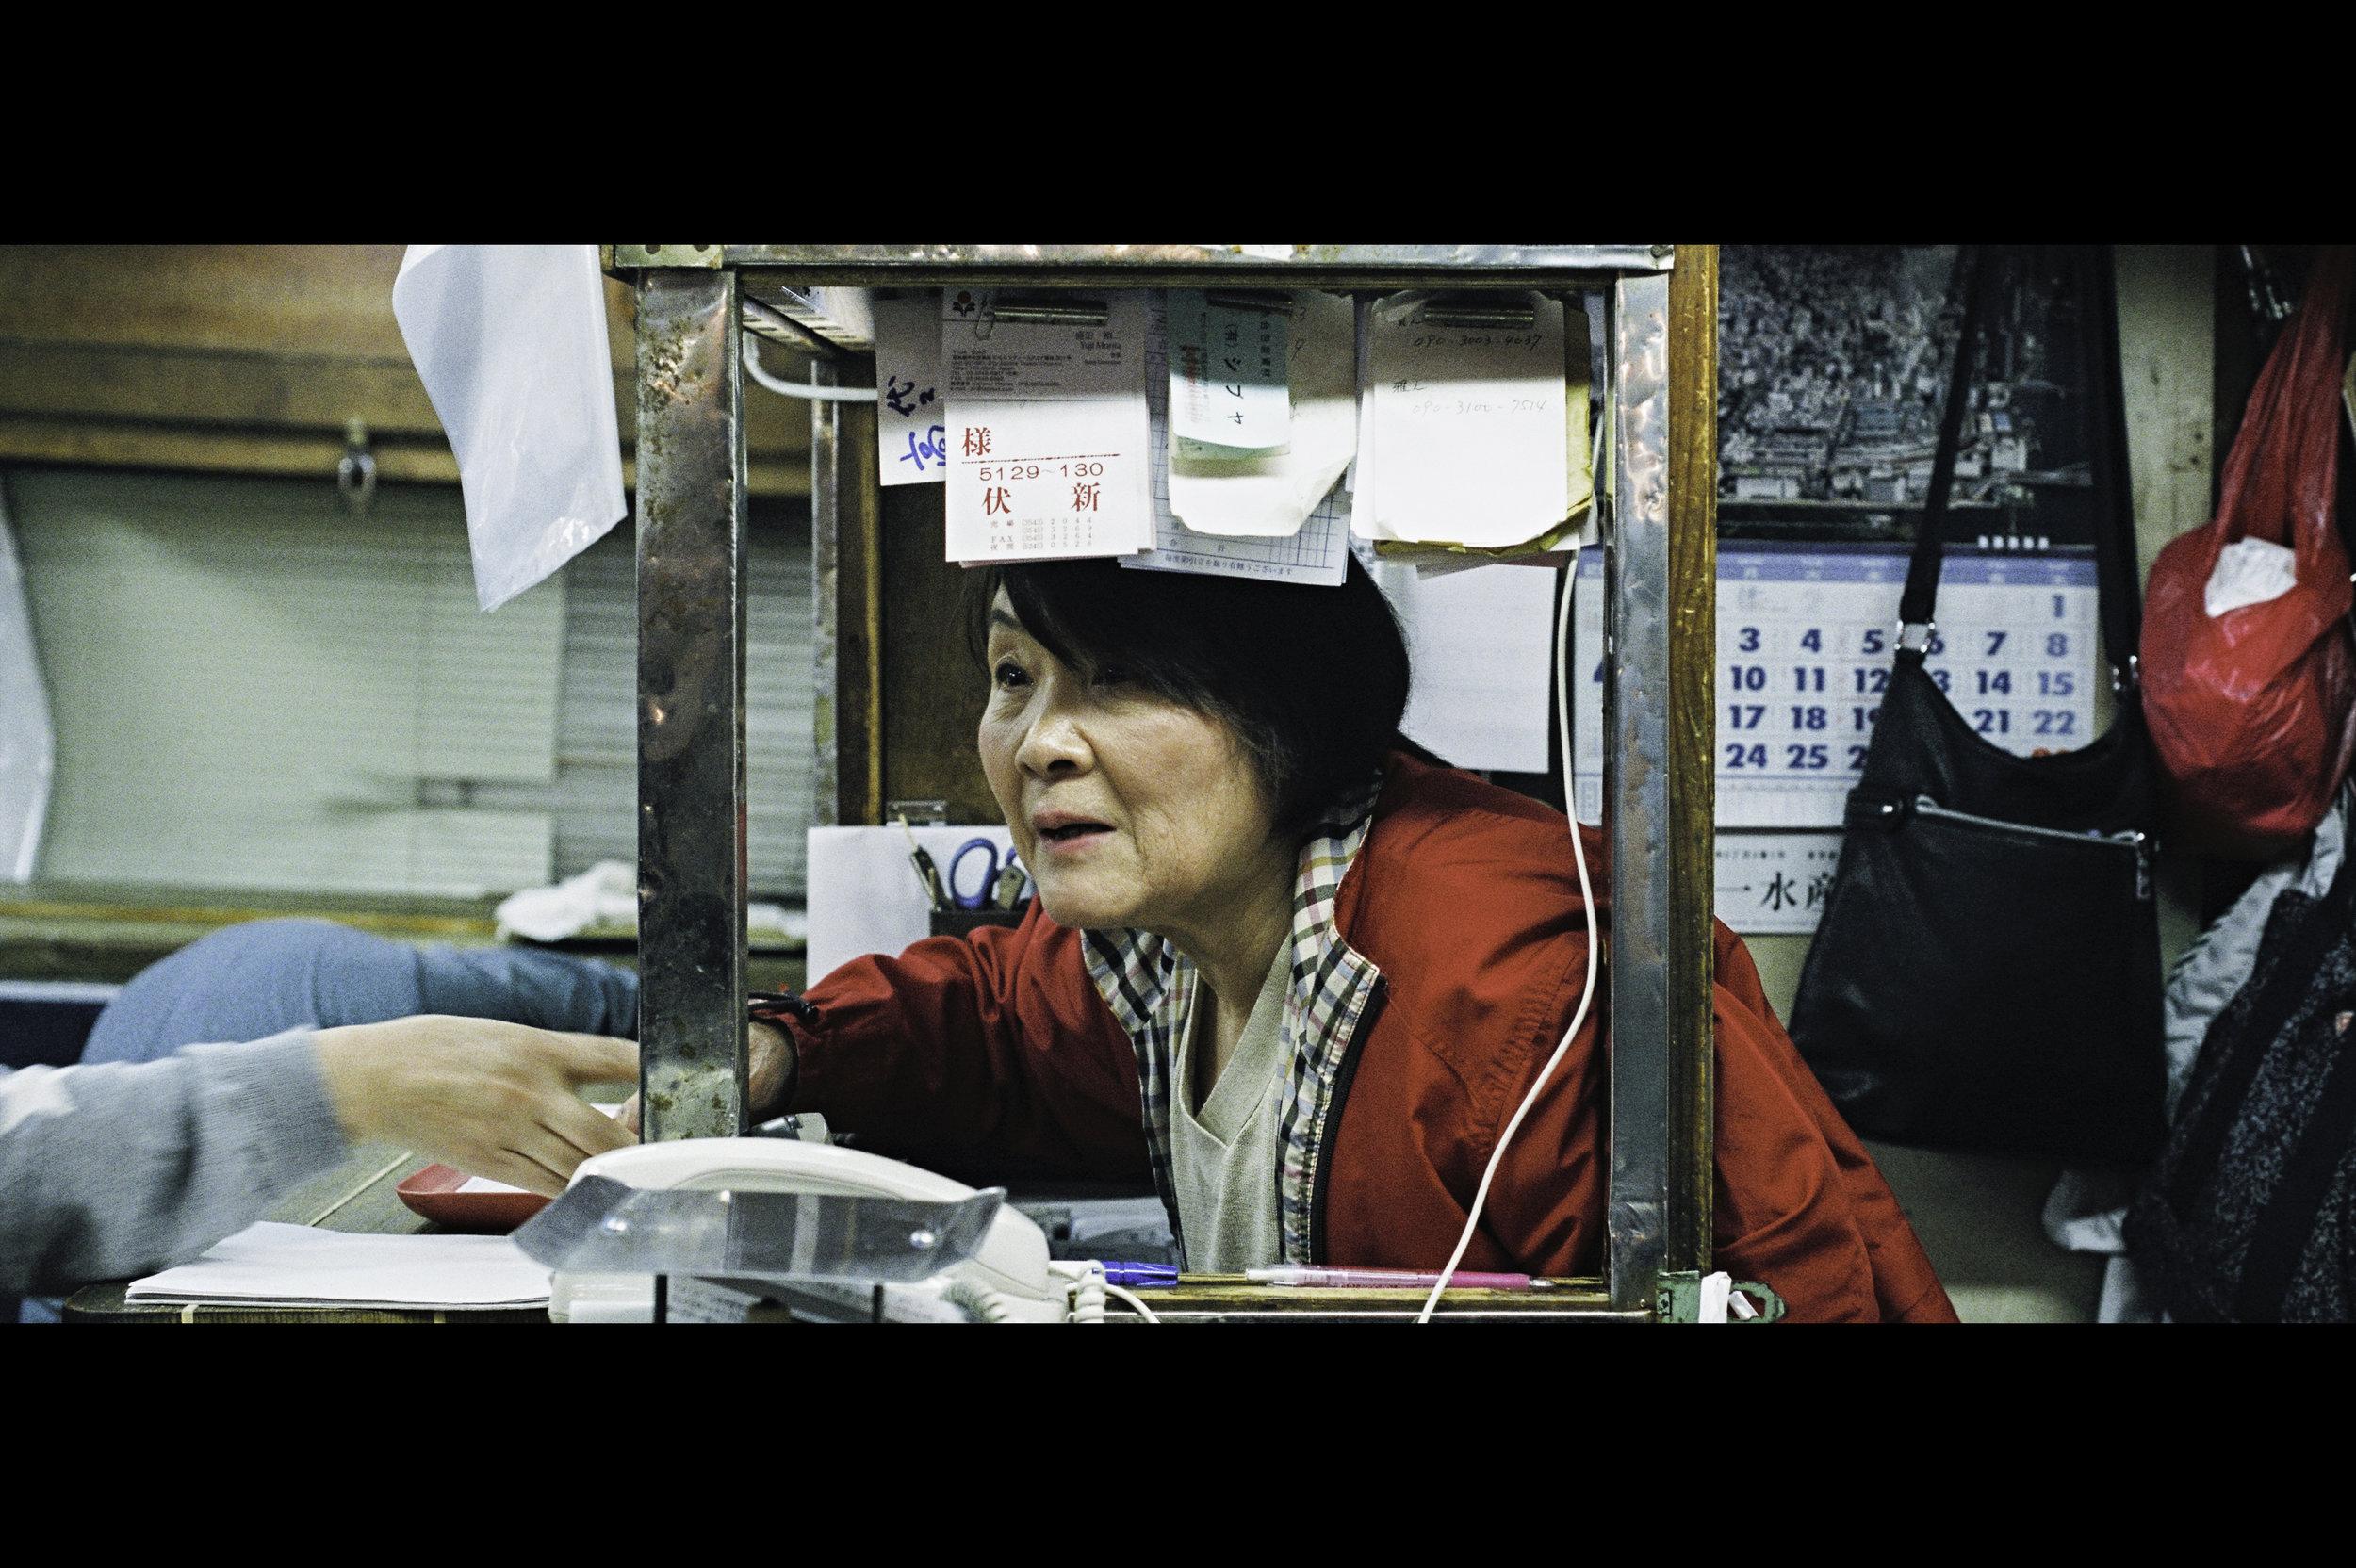 woman-tsukiji-fish-market-vendor-booth